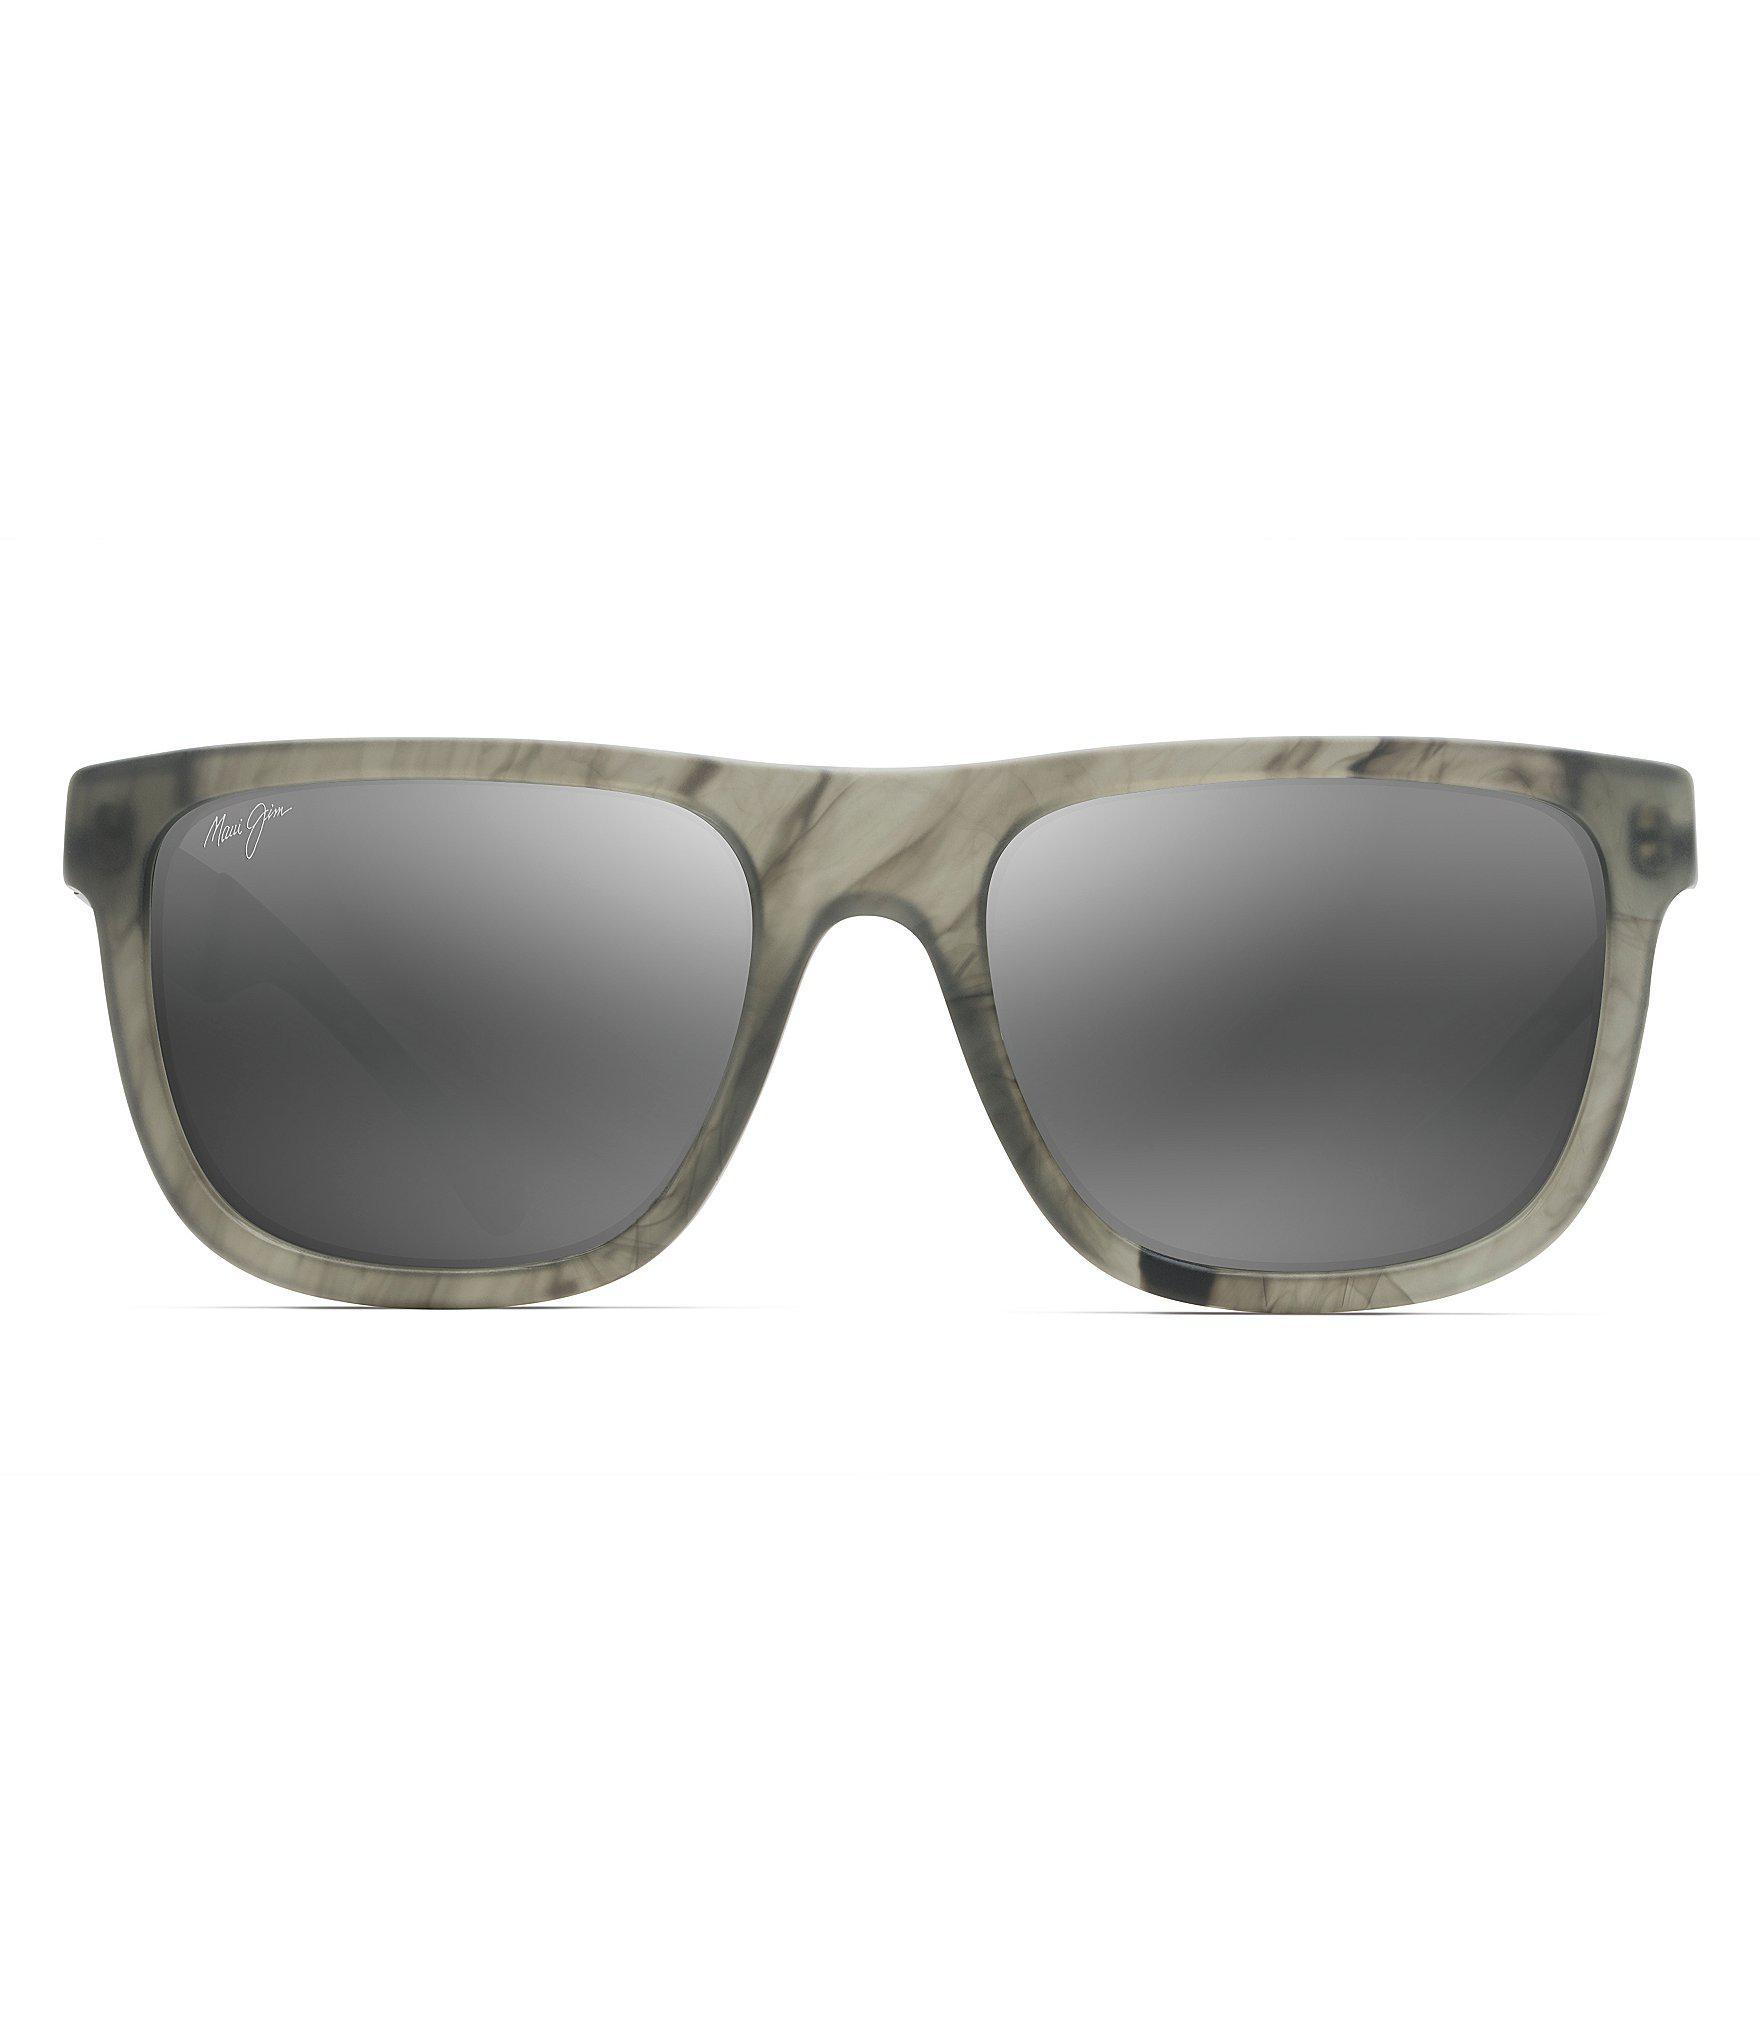 edcee9e2d87 Lyst - Maui Jim Talk Story Polarized Sunglasses in Gray for Men